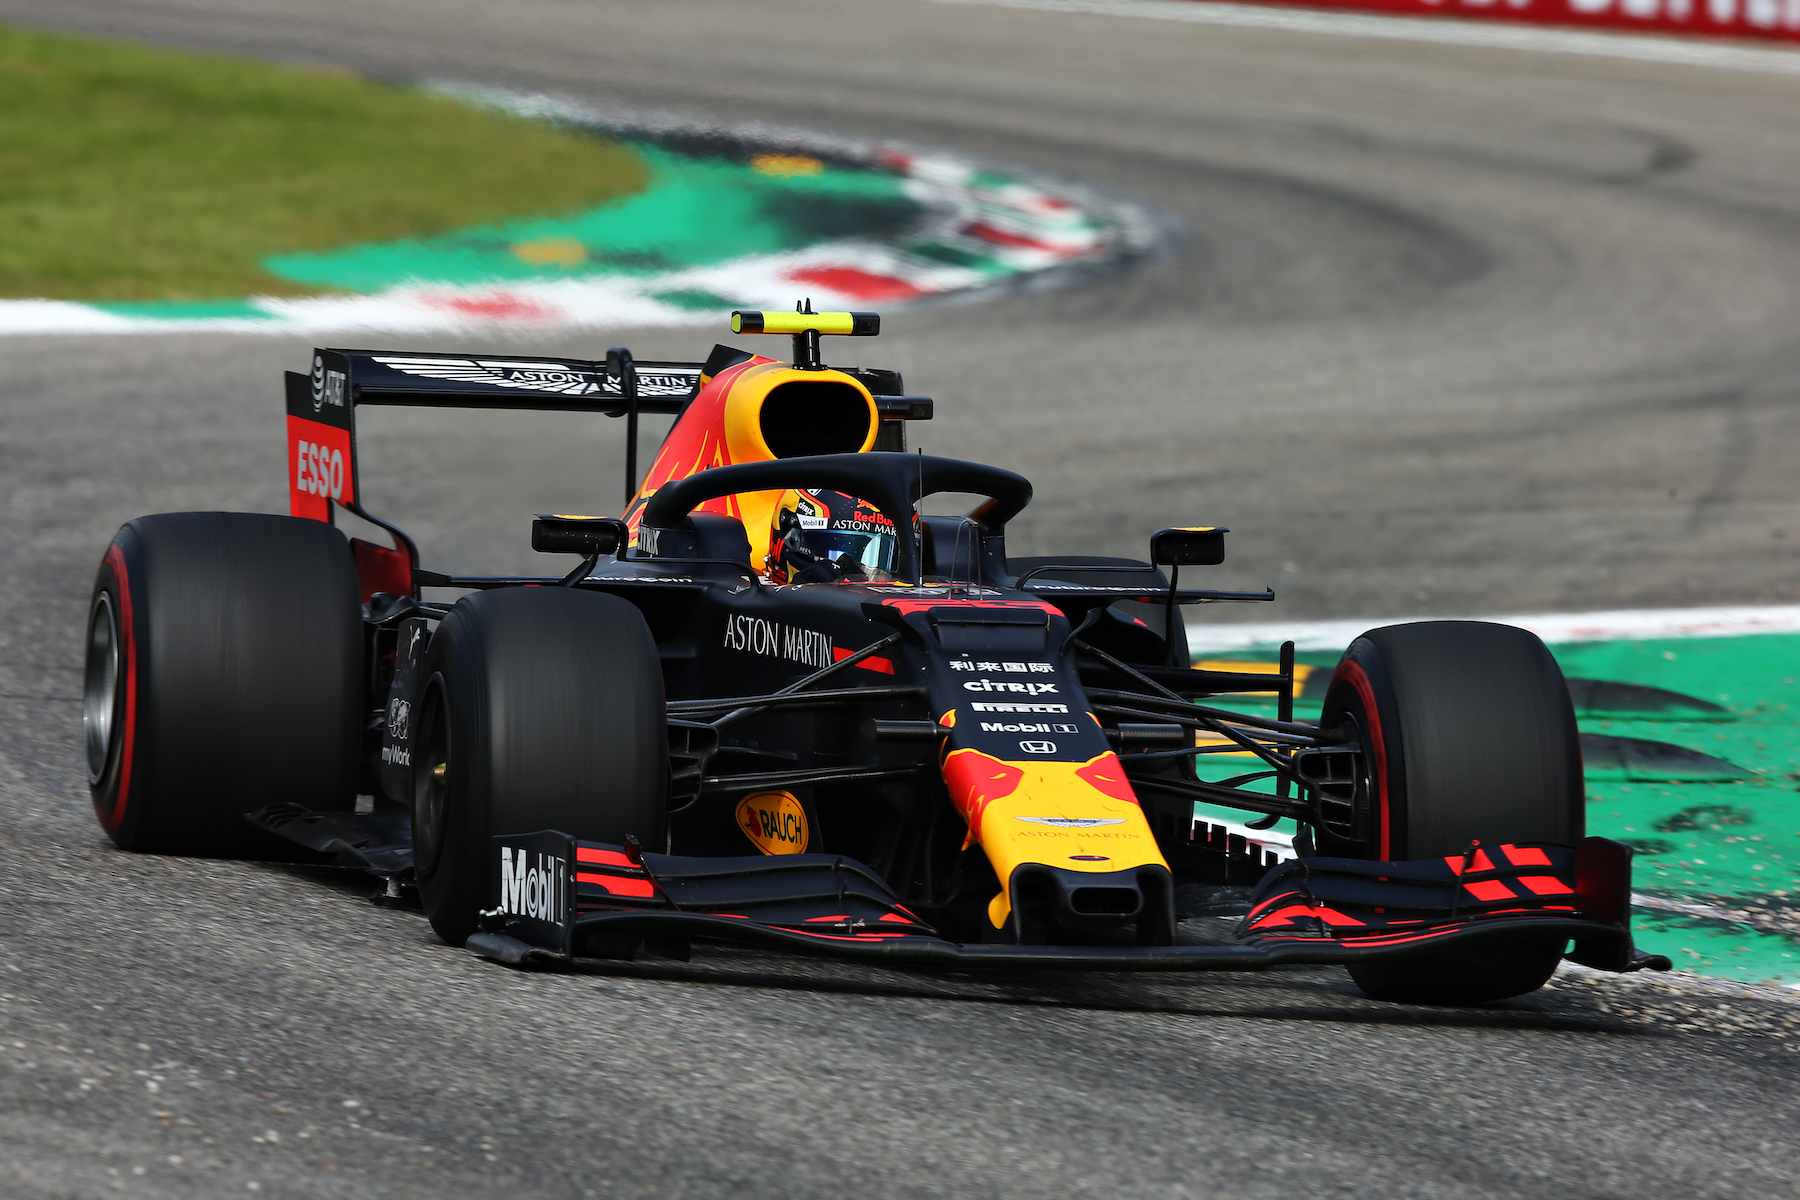 3 2019 Italian GP Sunday 13.jpg